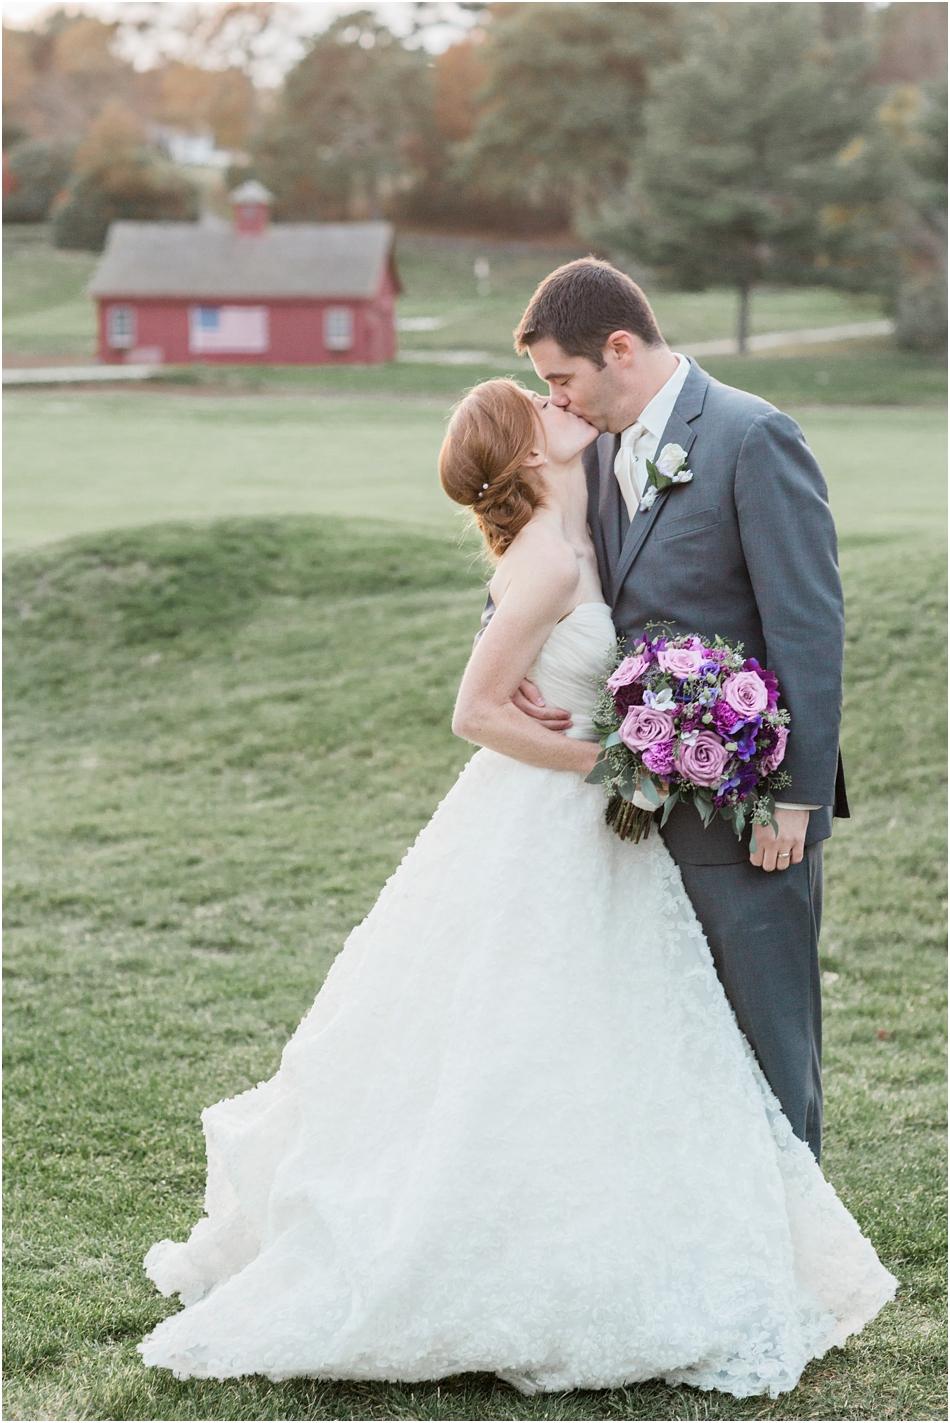 willowbend_megan_david_country_club_cape_cod_boston_new_england_wedding_photographer_Meredith_Jane_Photography_photo_0214.jpg